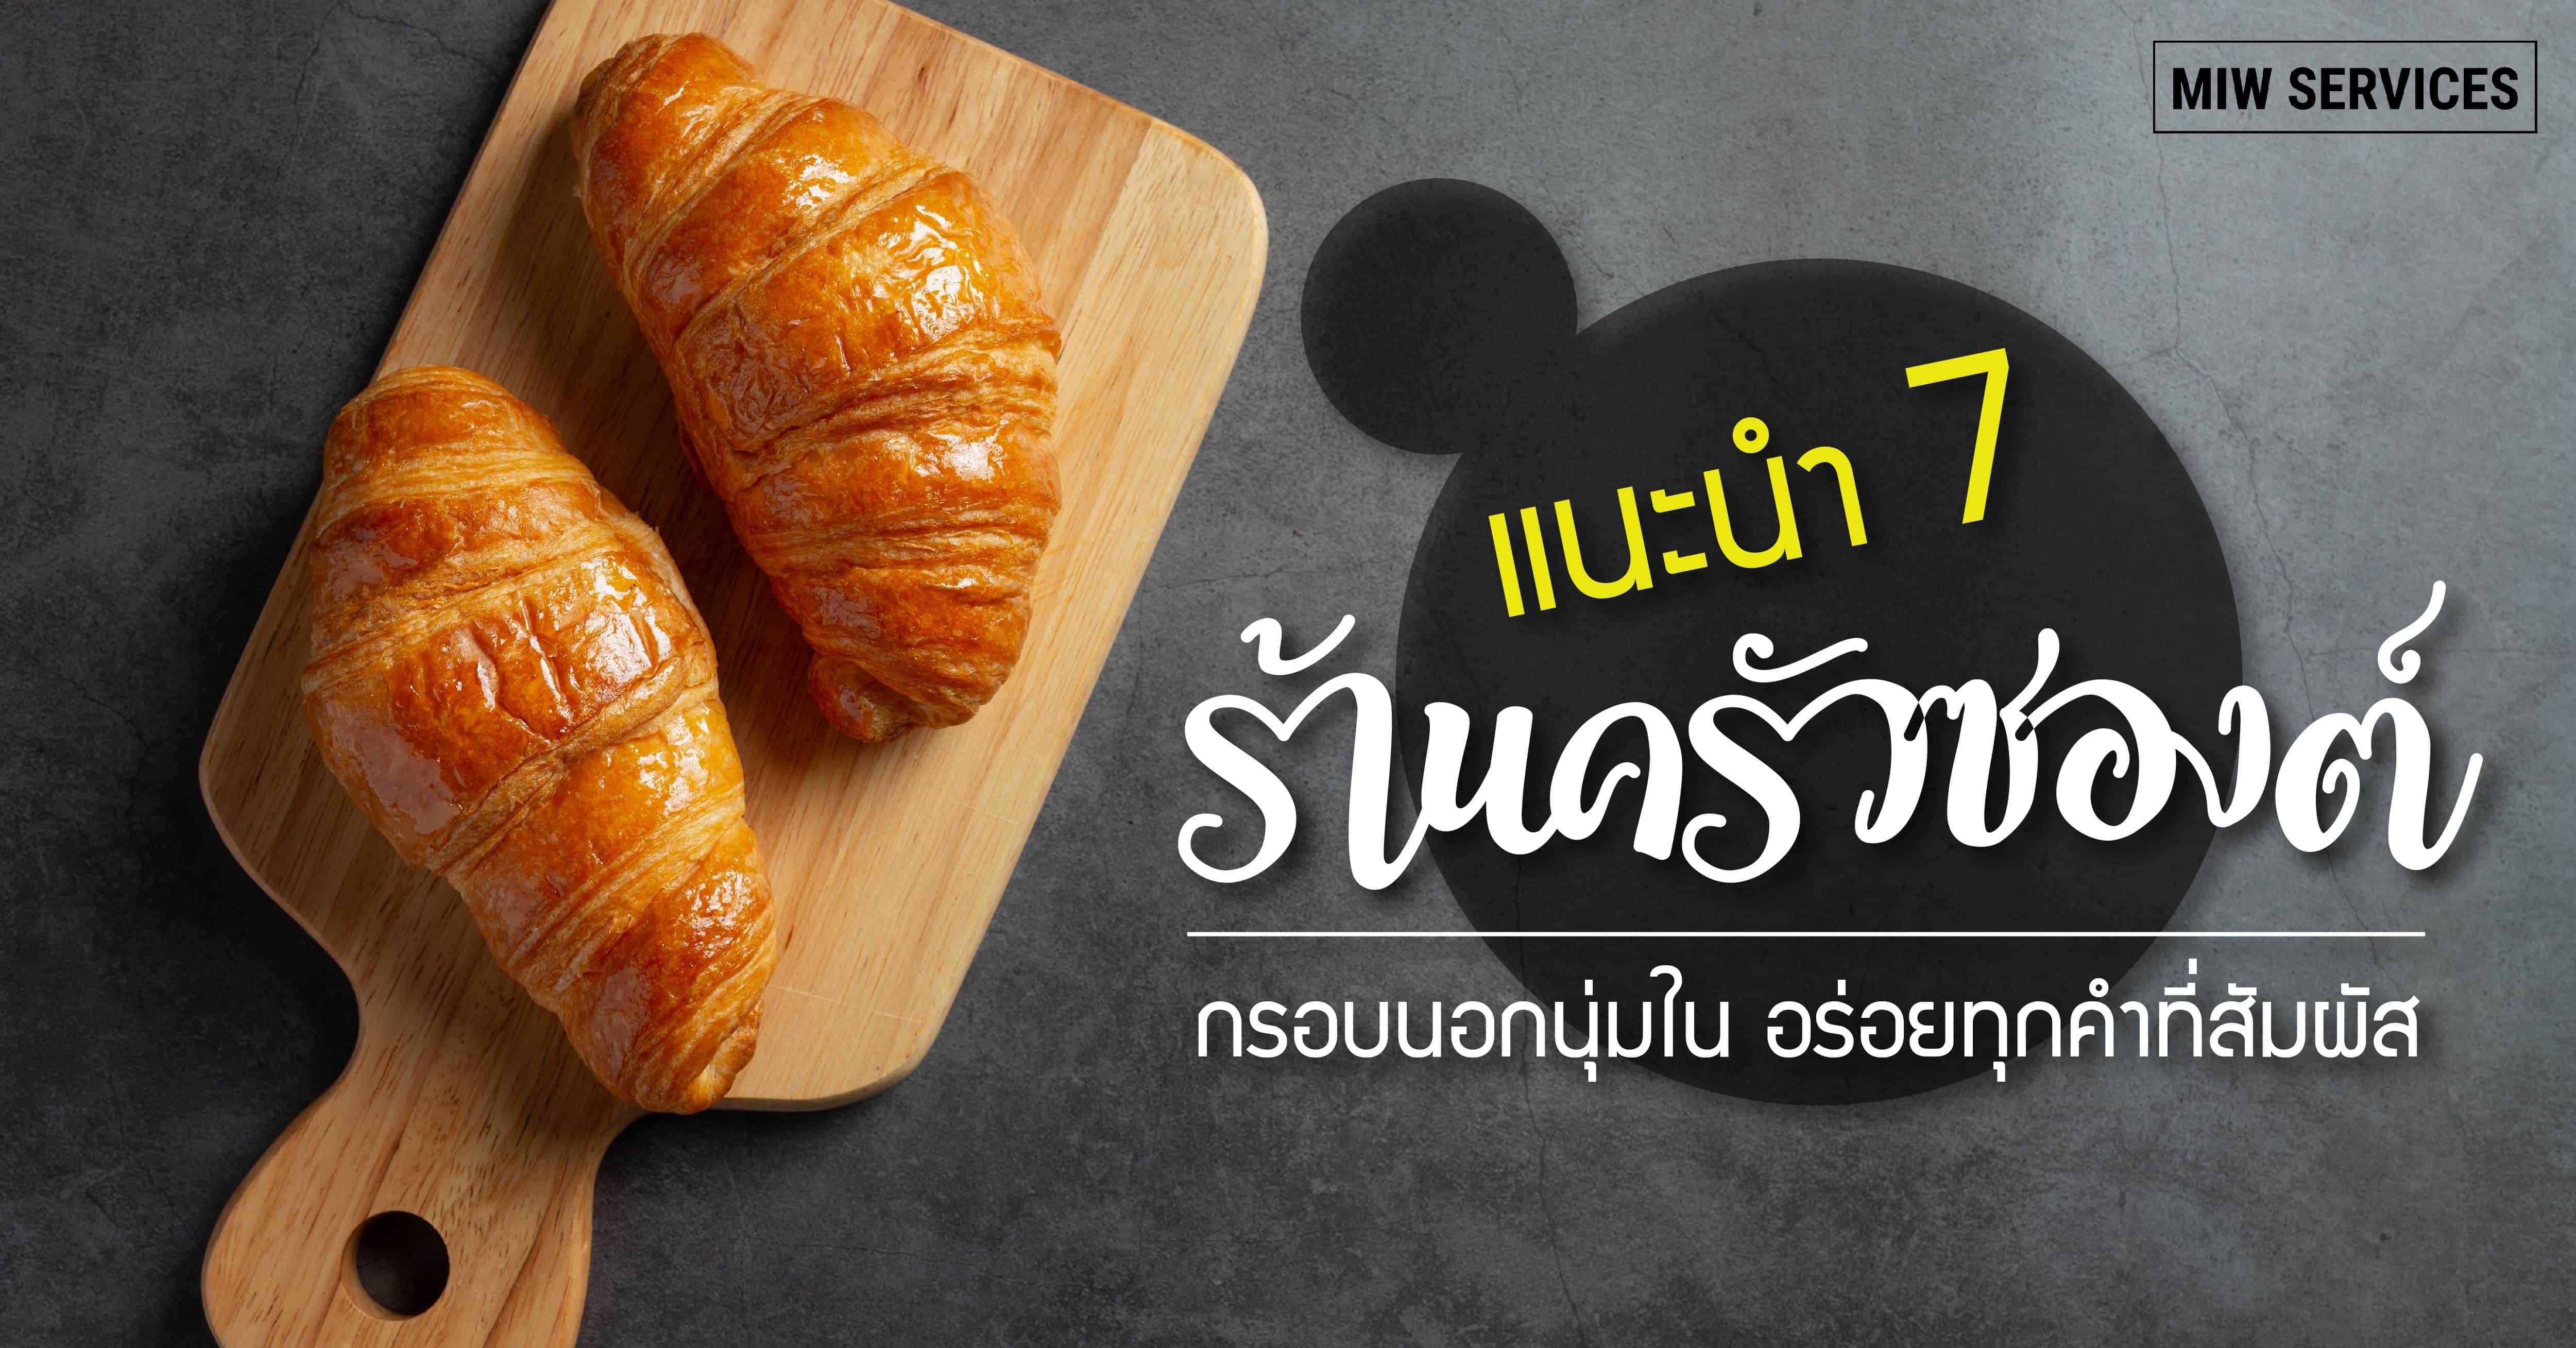 croissant - แนะนำ 7 ร้านครัวซองต์ กรอบนอกนุ่มใน อร่อยทุกคำที่สัมผัส